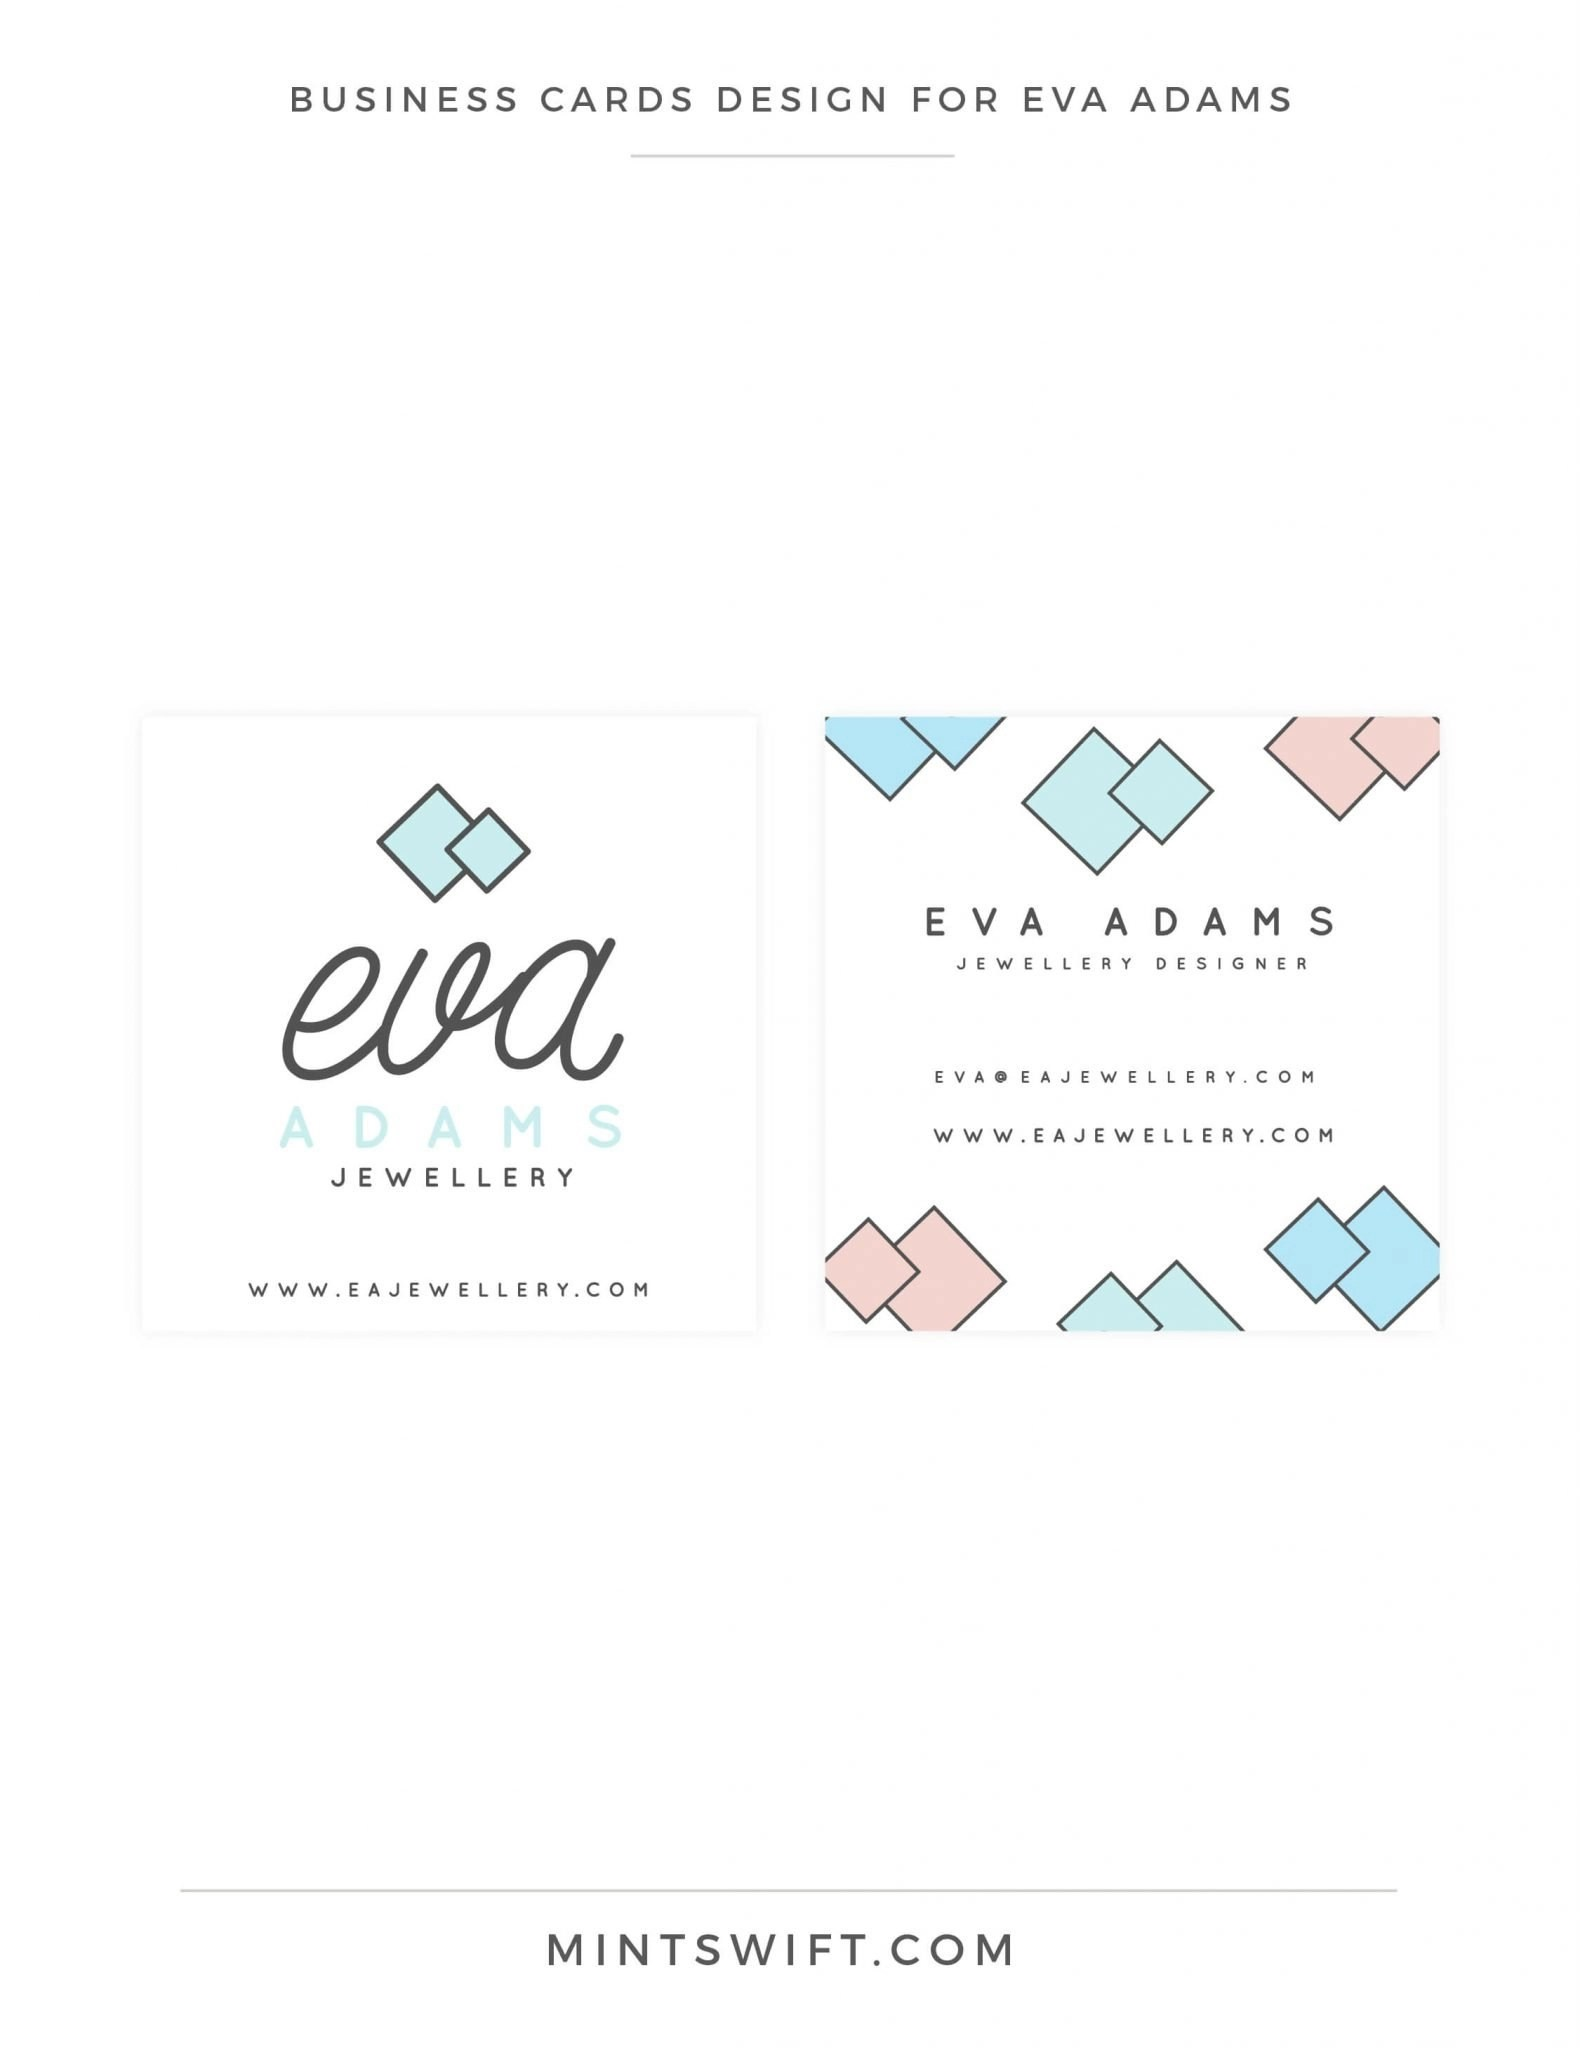 Eva Adams - Business cards design - MintSwift